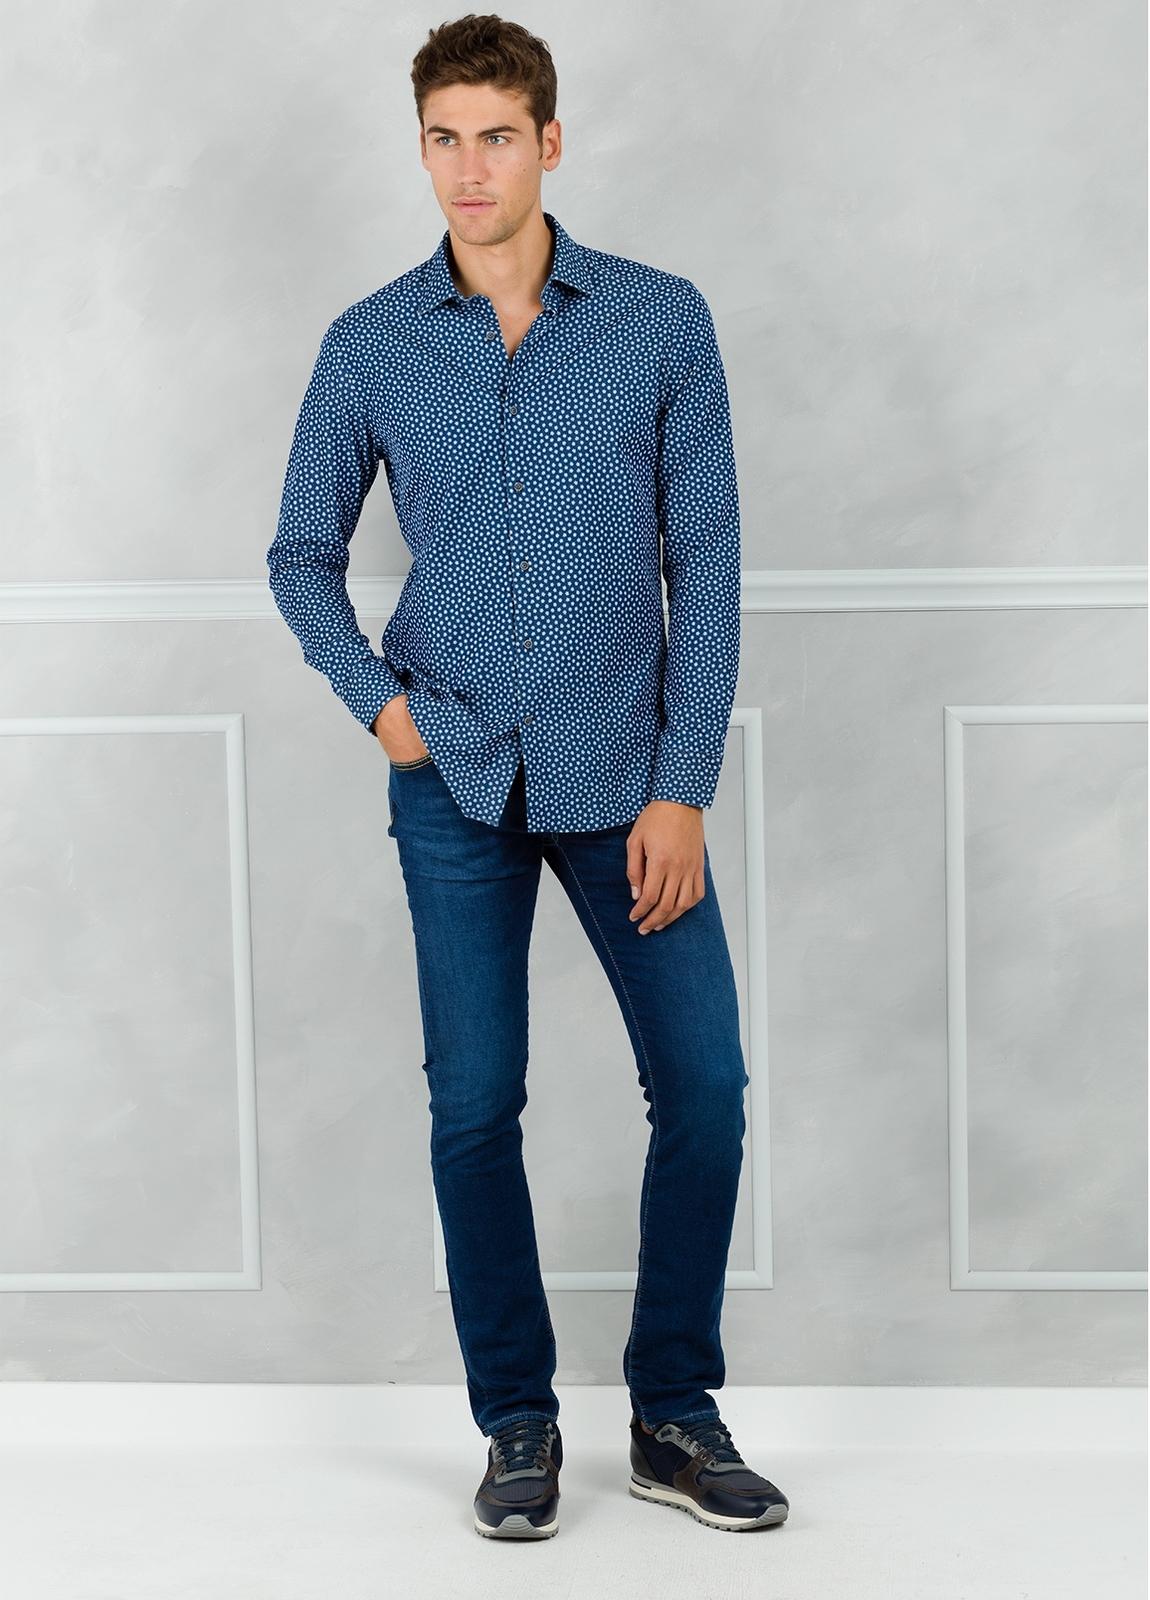 Camisa Leisure Wear SLIM FIT modelo PORTO dibujo floral, color azul. 100% Algodón. - Ítem1